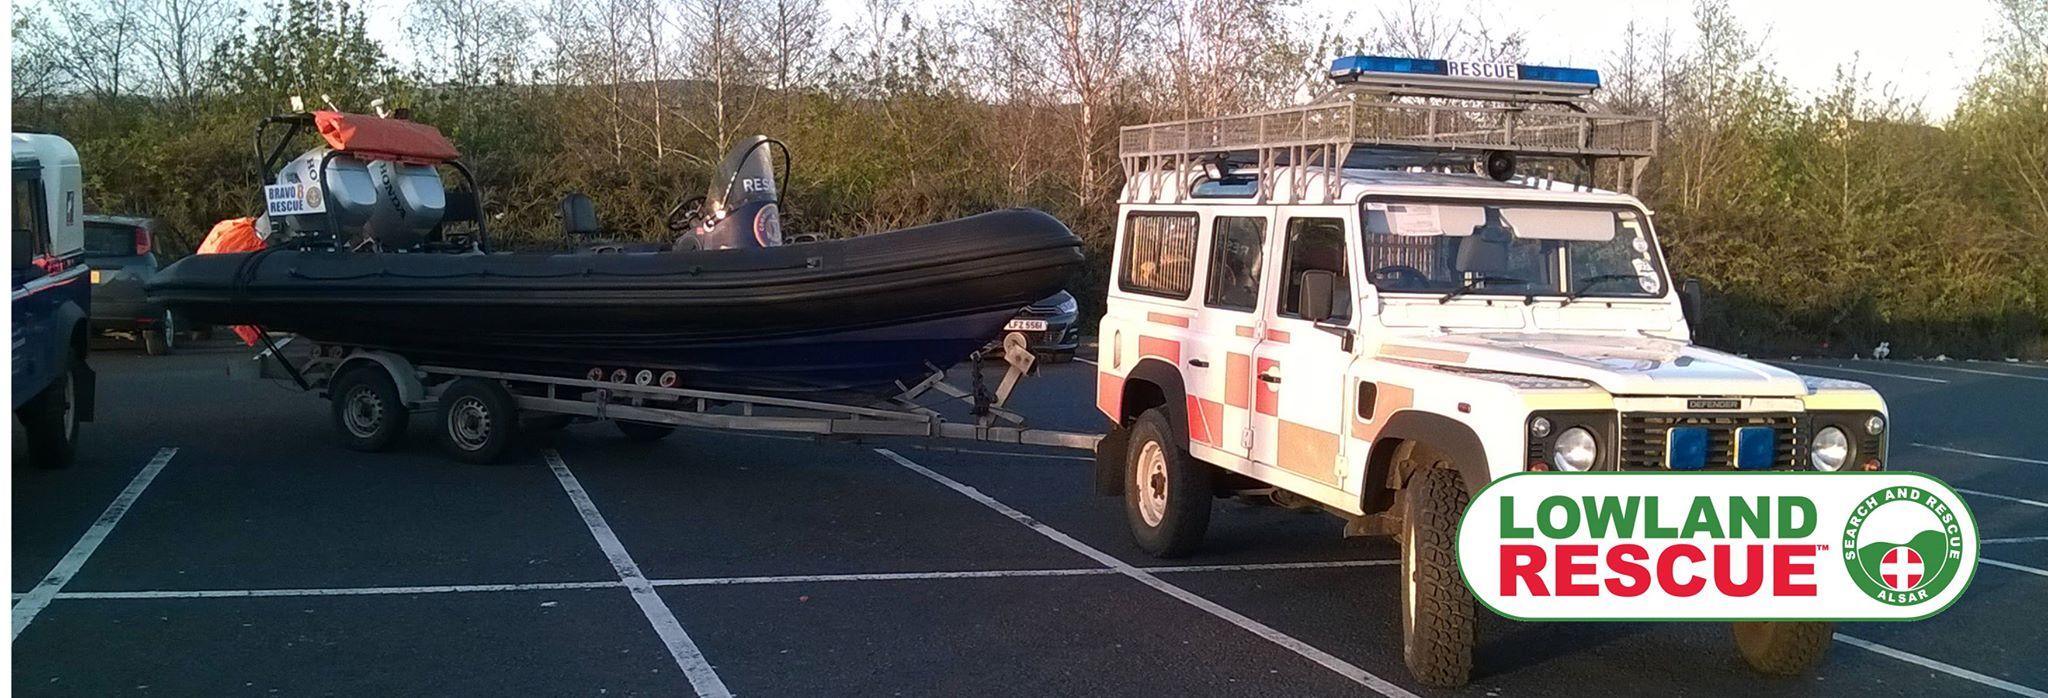 Portglenone Community Rescue Service Needs You